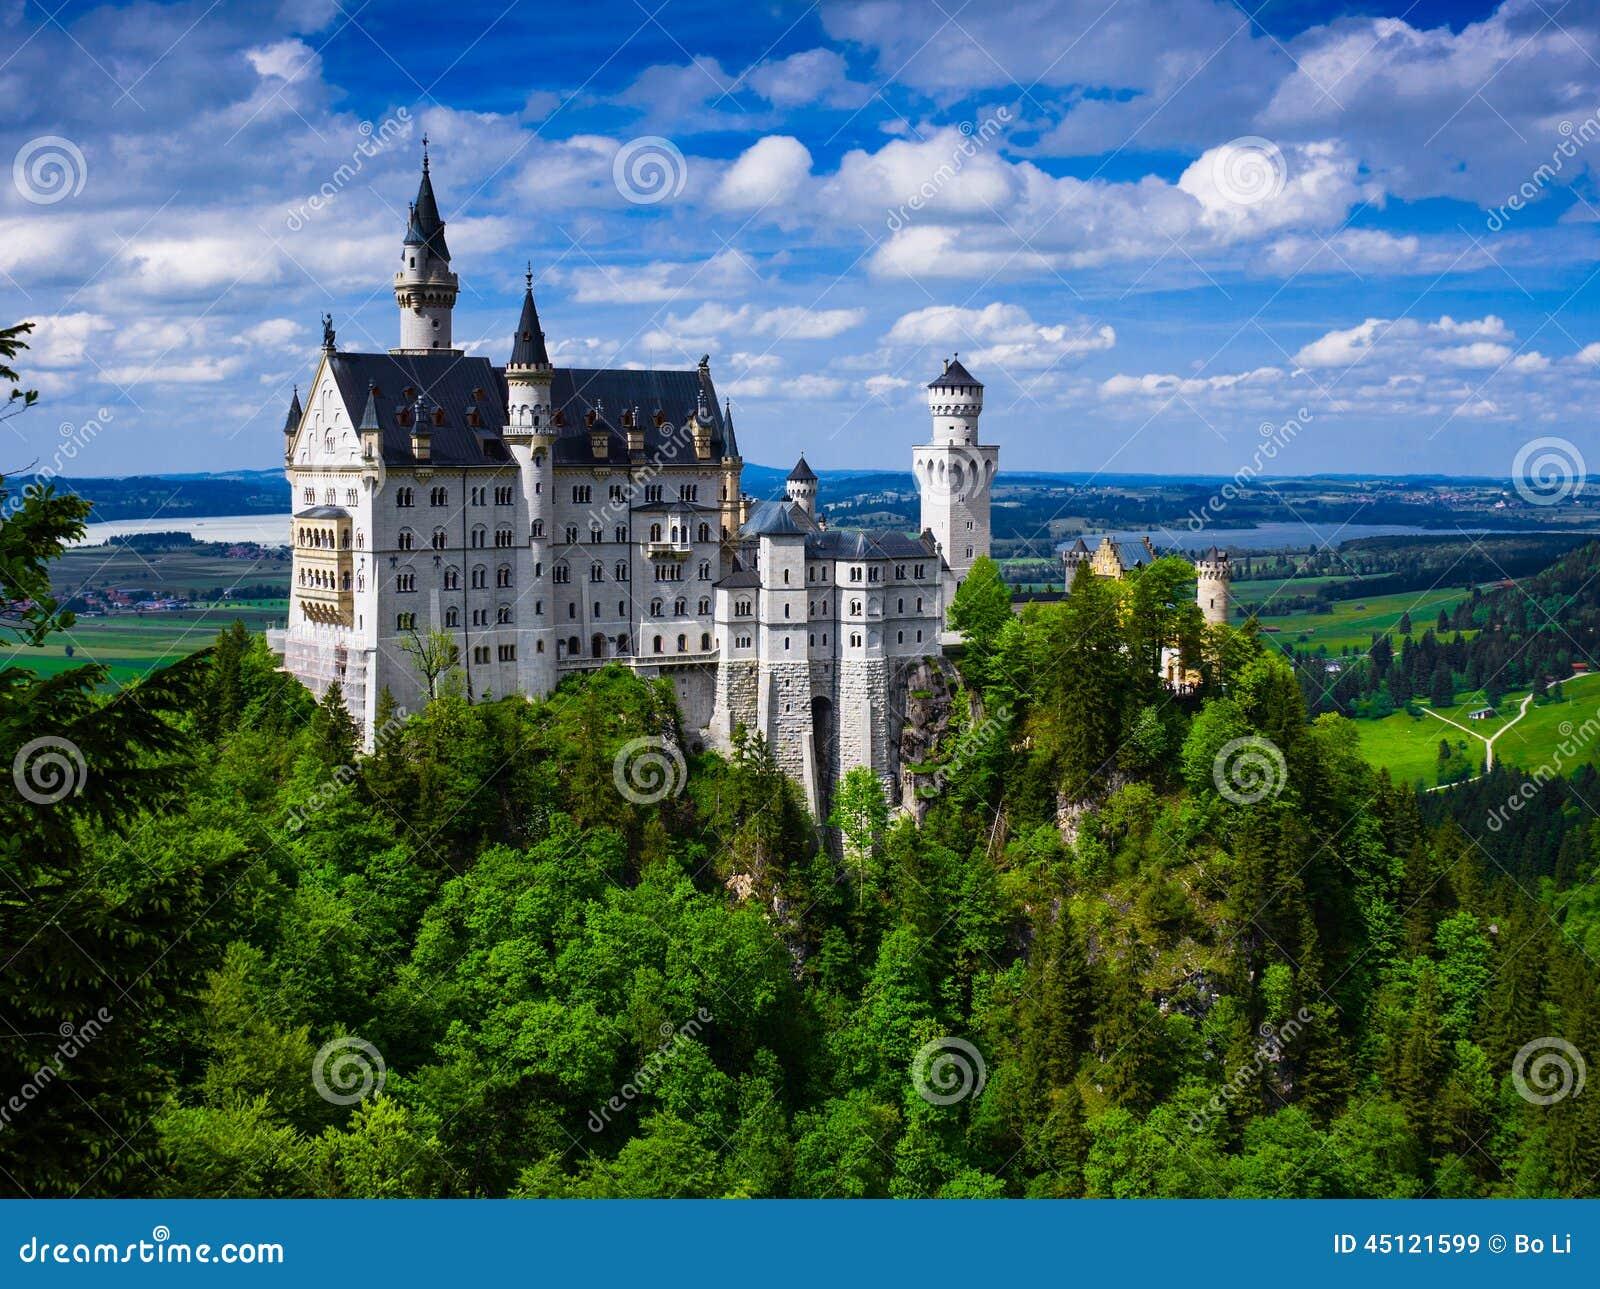 Château de Neuschwanstein (nouveau château de Swanstone)